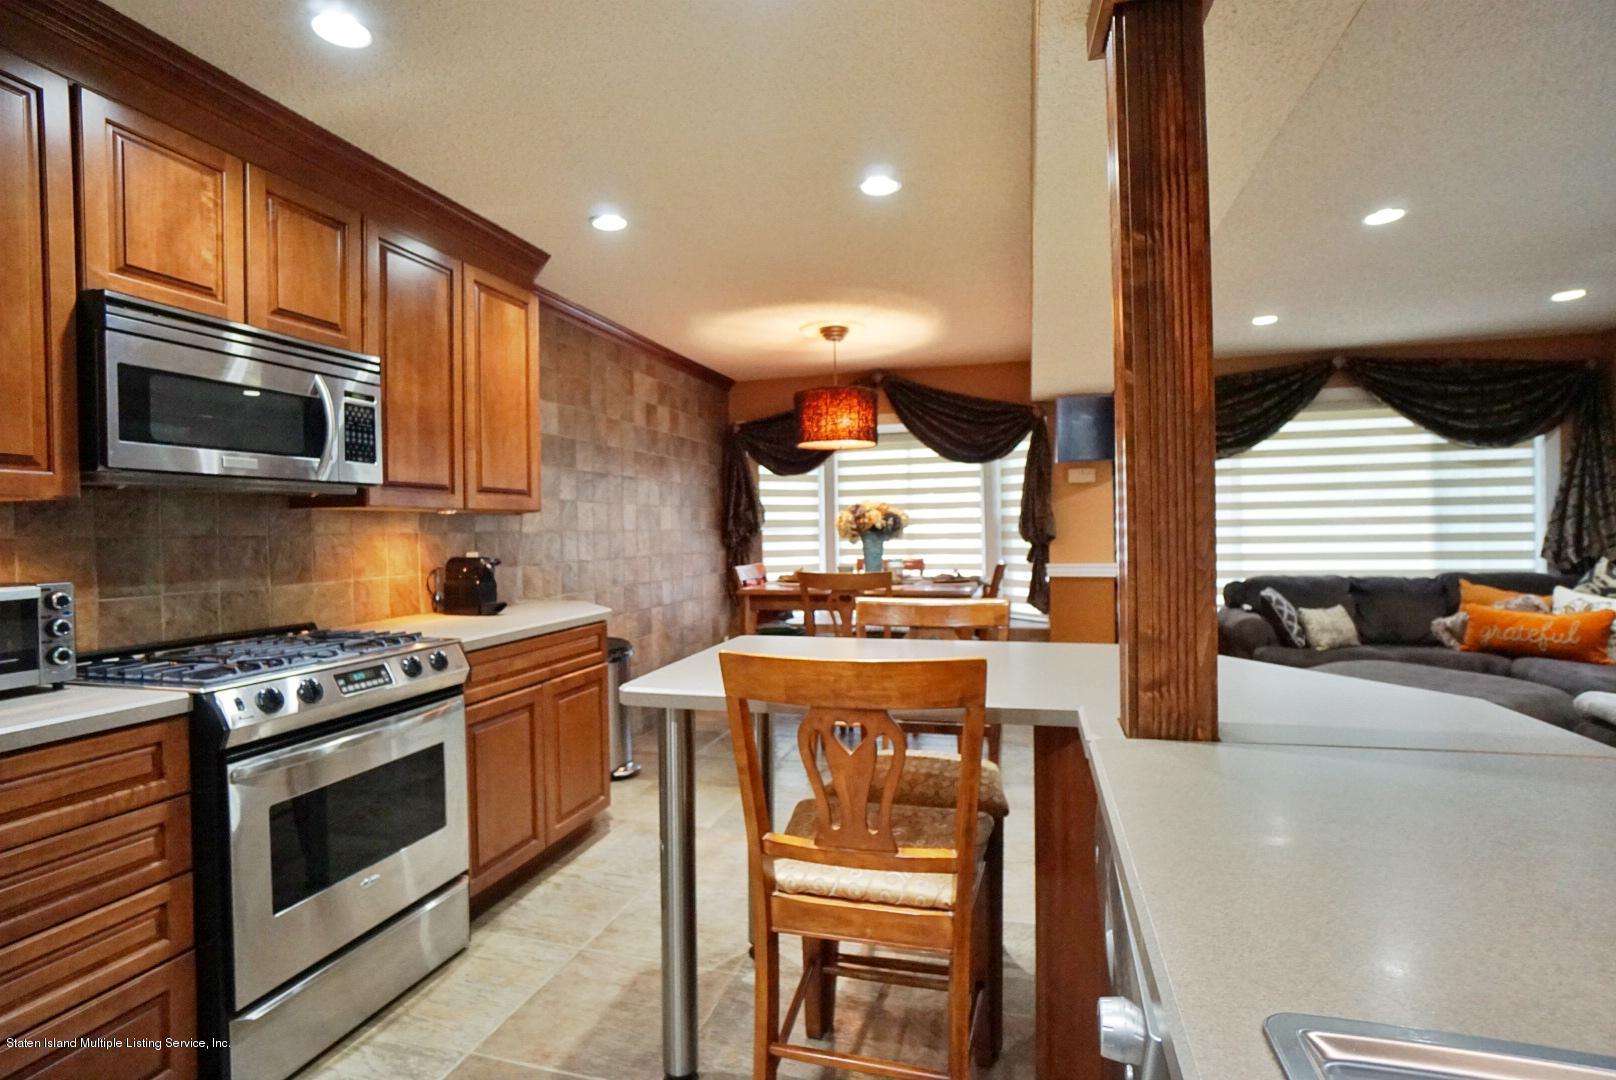 Single Family - Attached 30 Halpin Avenue  Staten Island, NY 10312, MLS-1132039-19